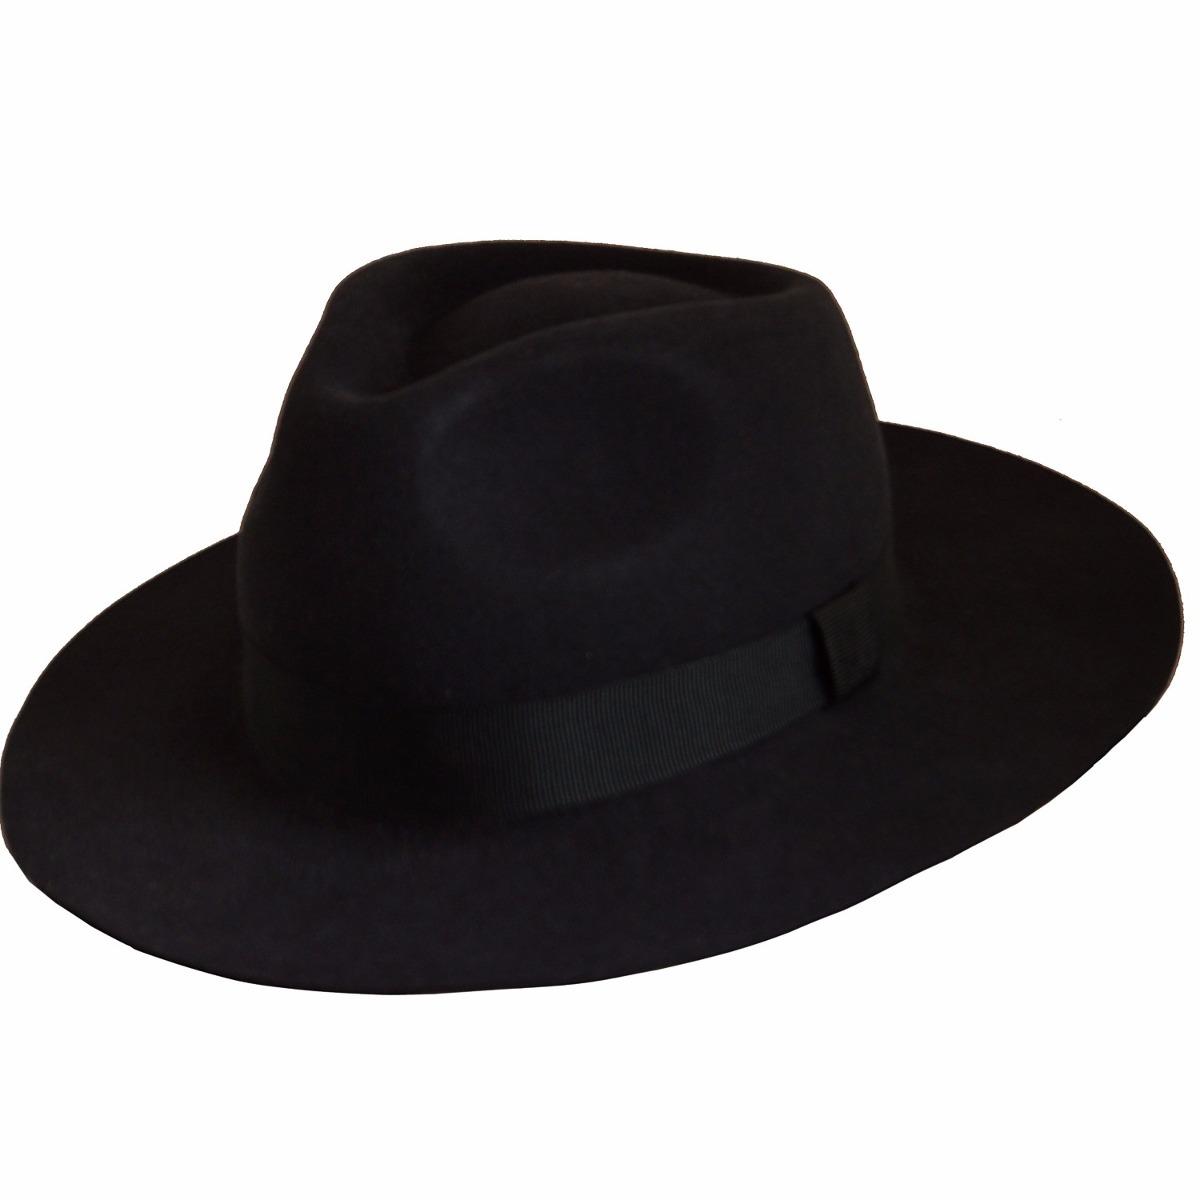 sombrero fieltro australiano compañia de sombreros h714000. Cargando zoom. b4e93cddd49